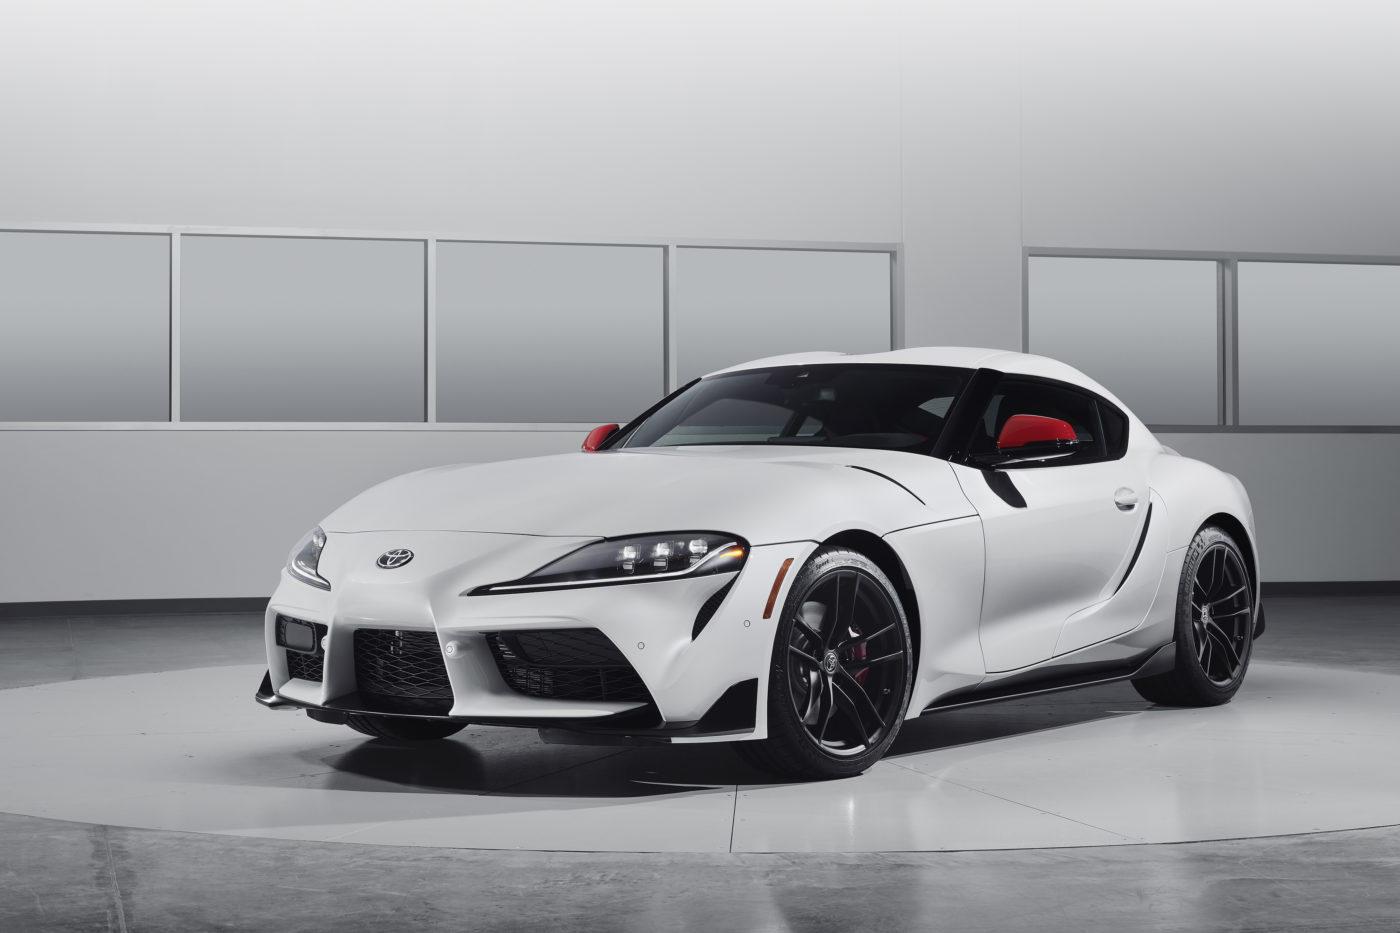 Toyota Supra 2015 Price >> 2020 Toyota Supra Price Specs Photos Review